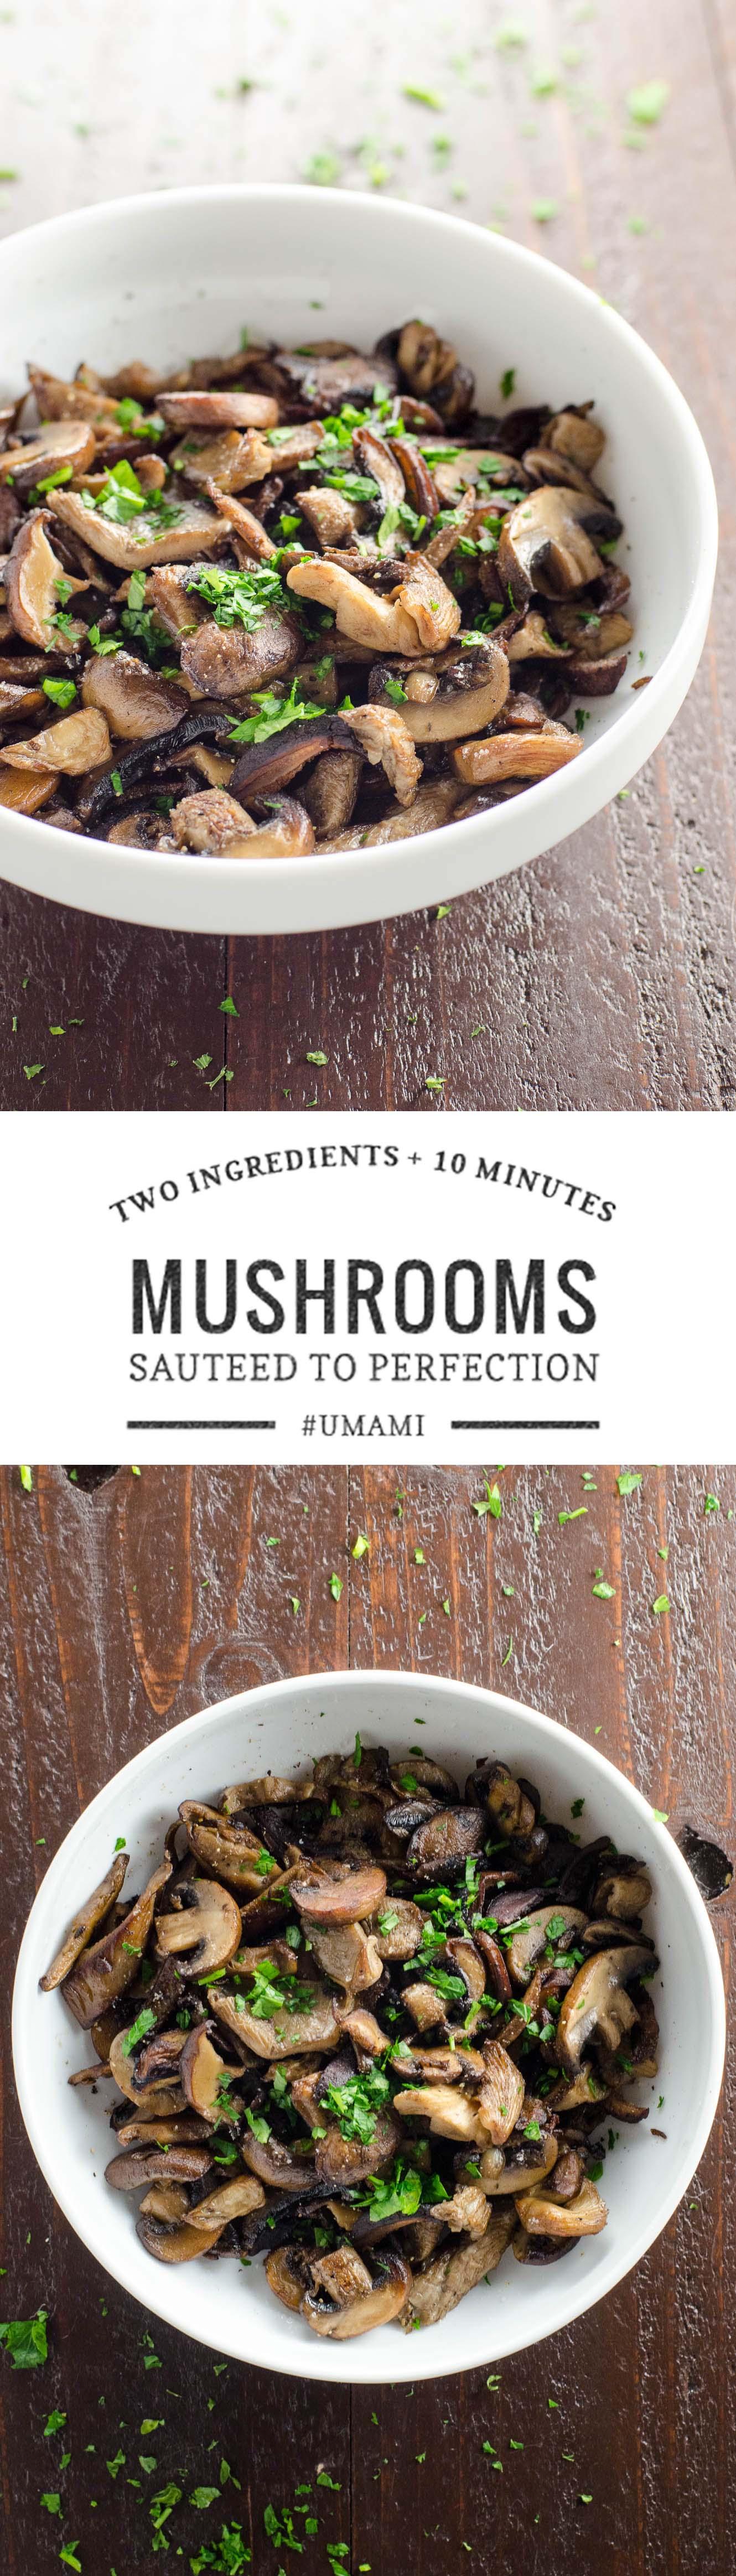 The best sautéed mushrooms recipe. Makes a great, easy, versatile side dish.